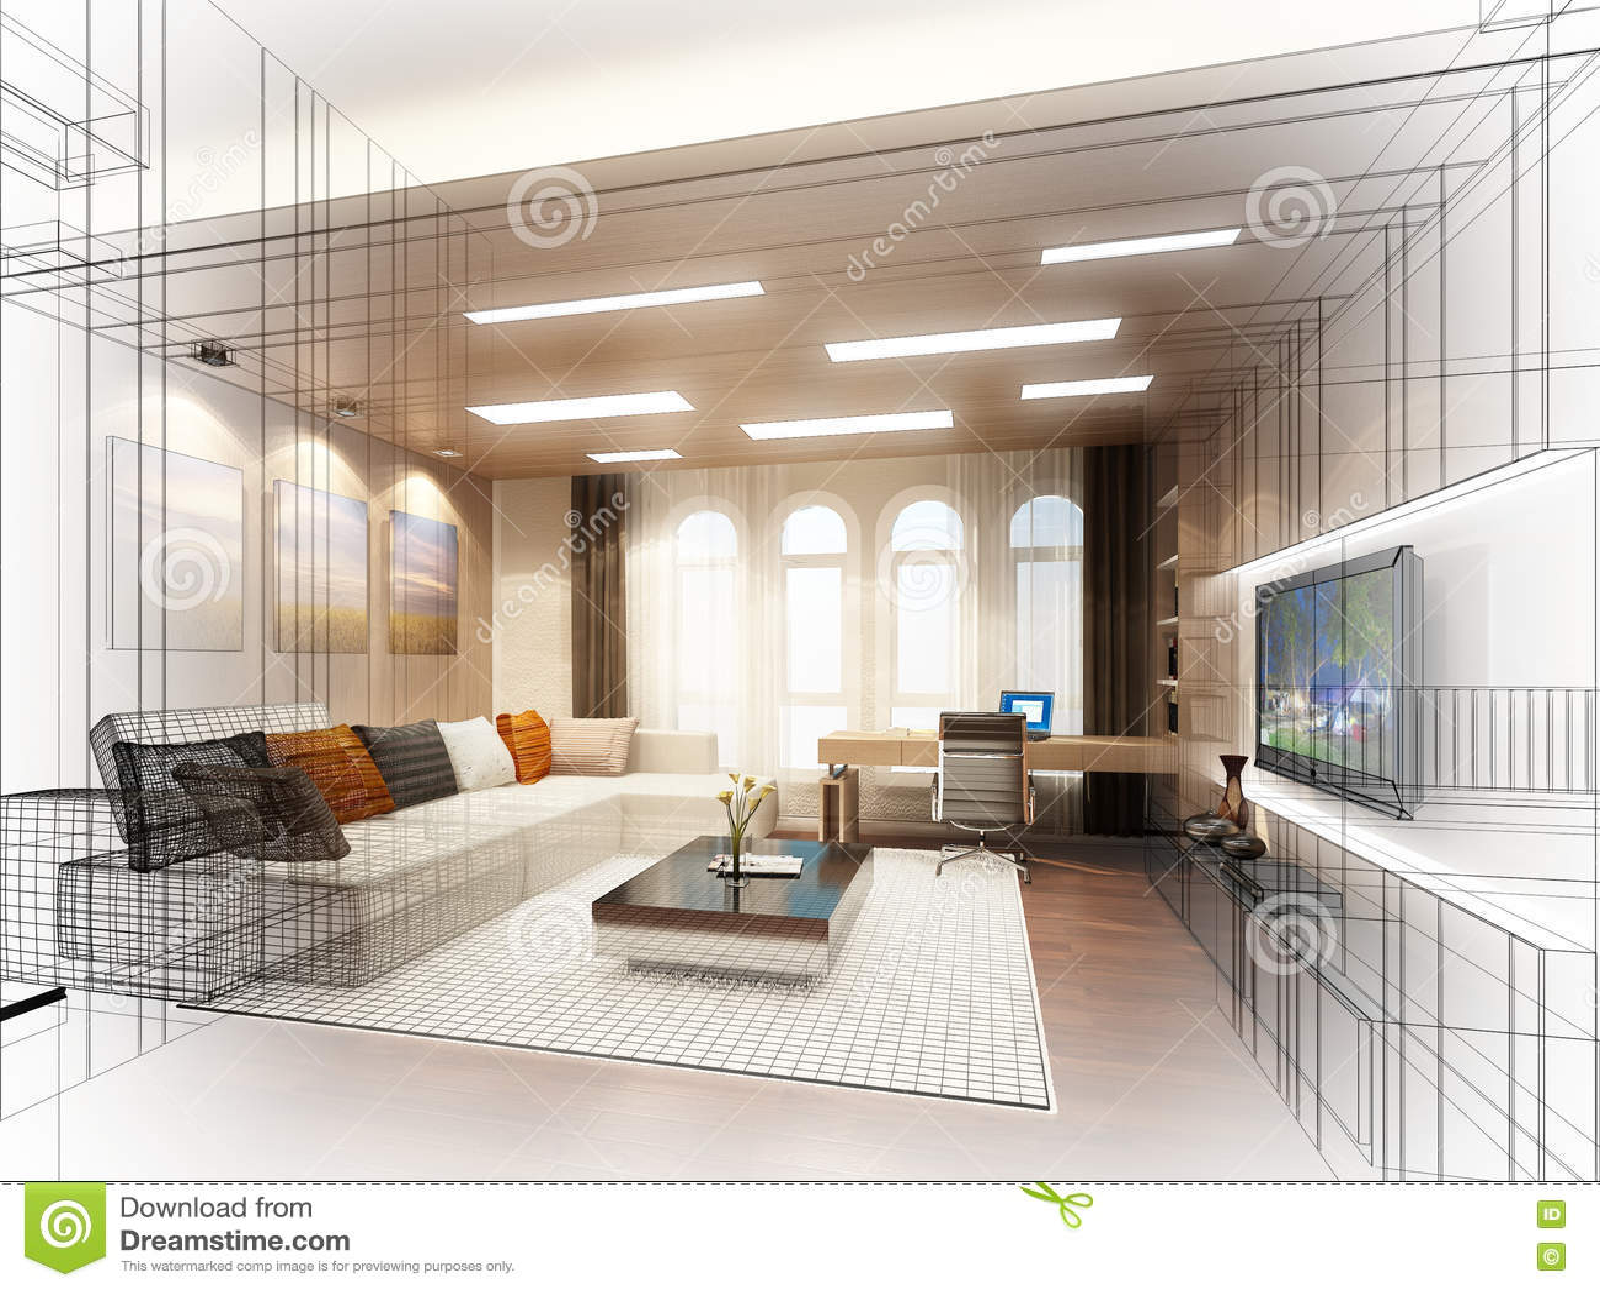 Sketch design of living room 3dwire frame stock for Living room interior design sketch